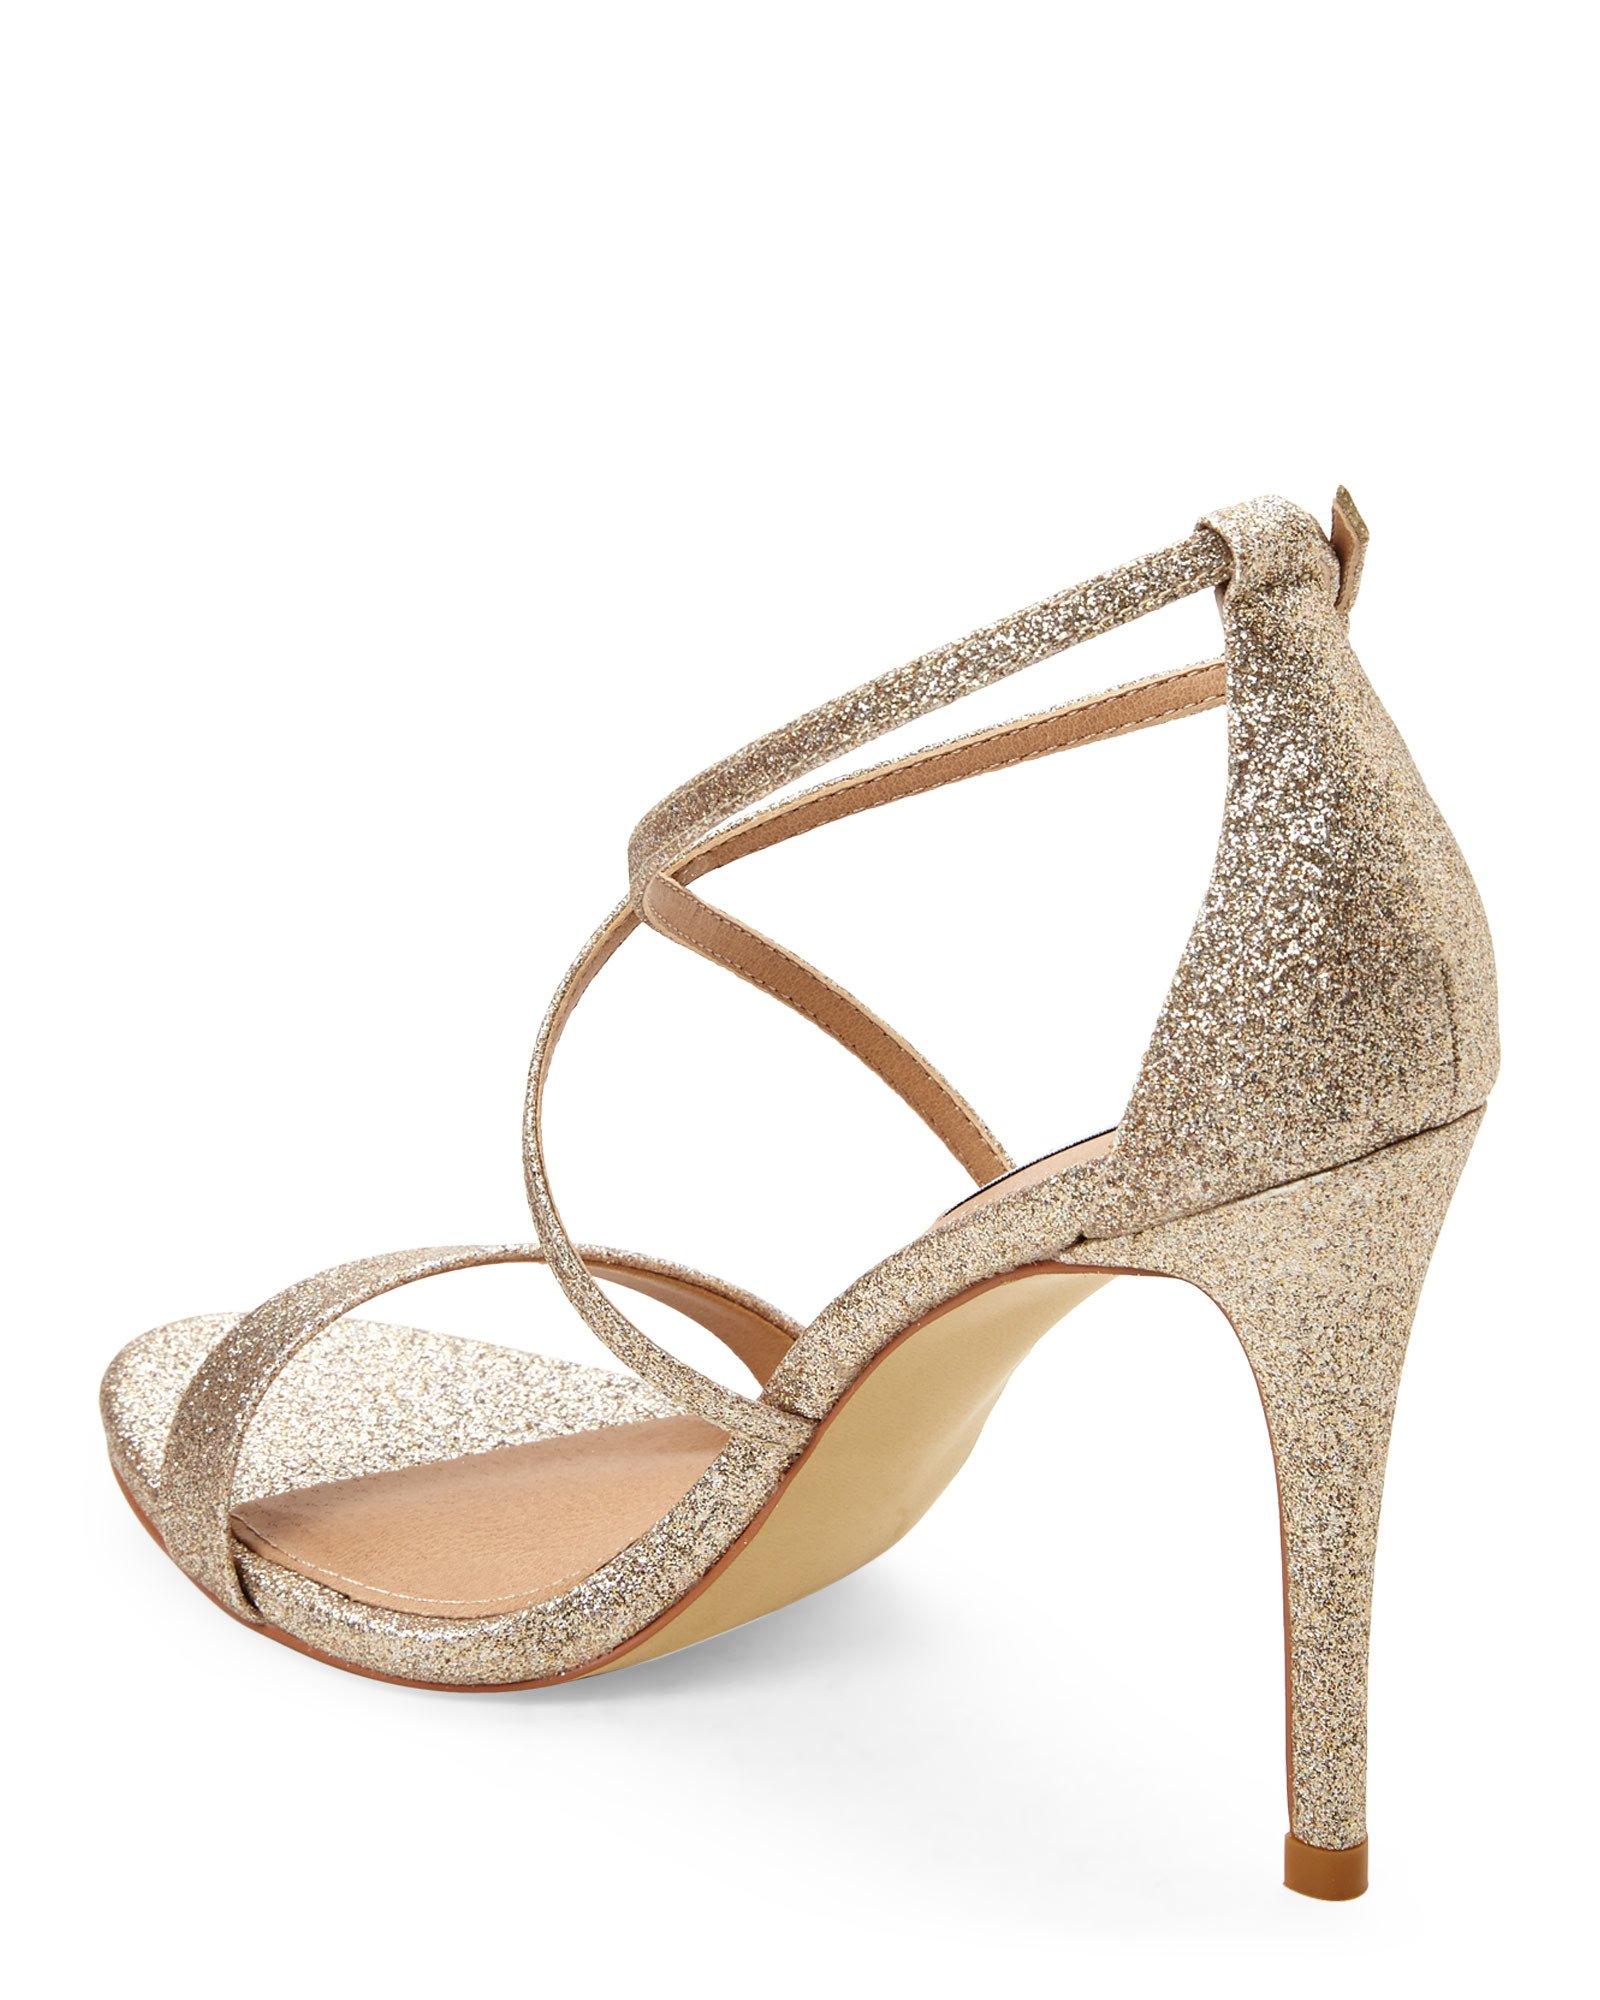 44bc0ef72c7 Gold Glitter Strappy Heels - Is Heel